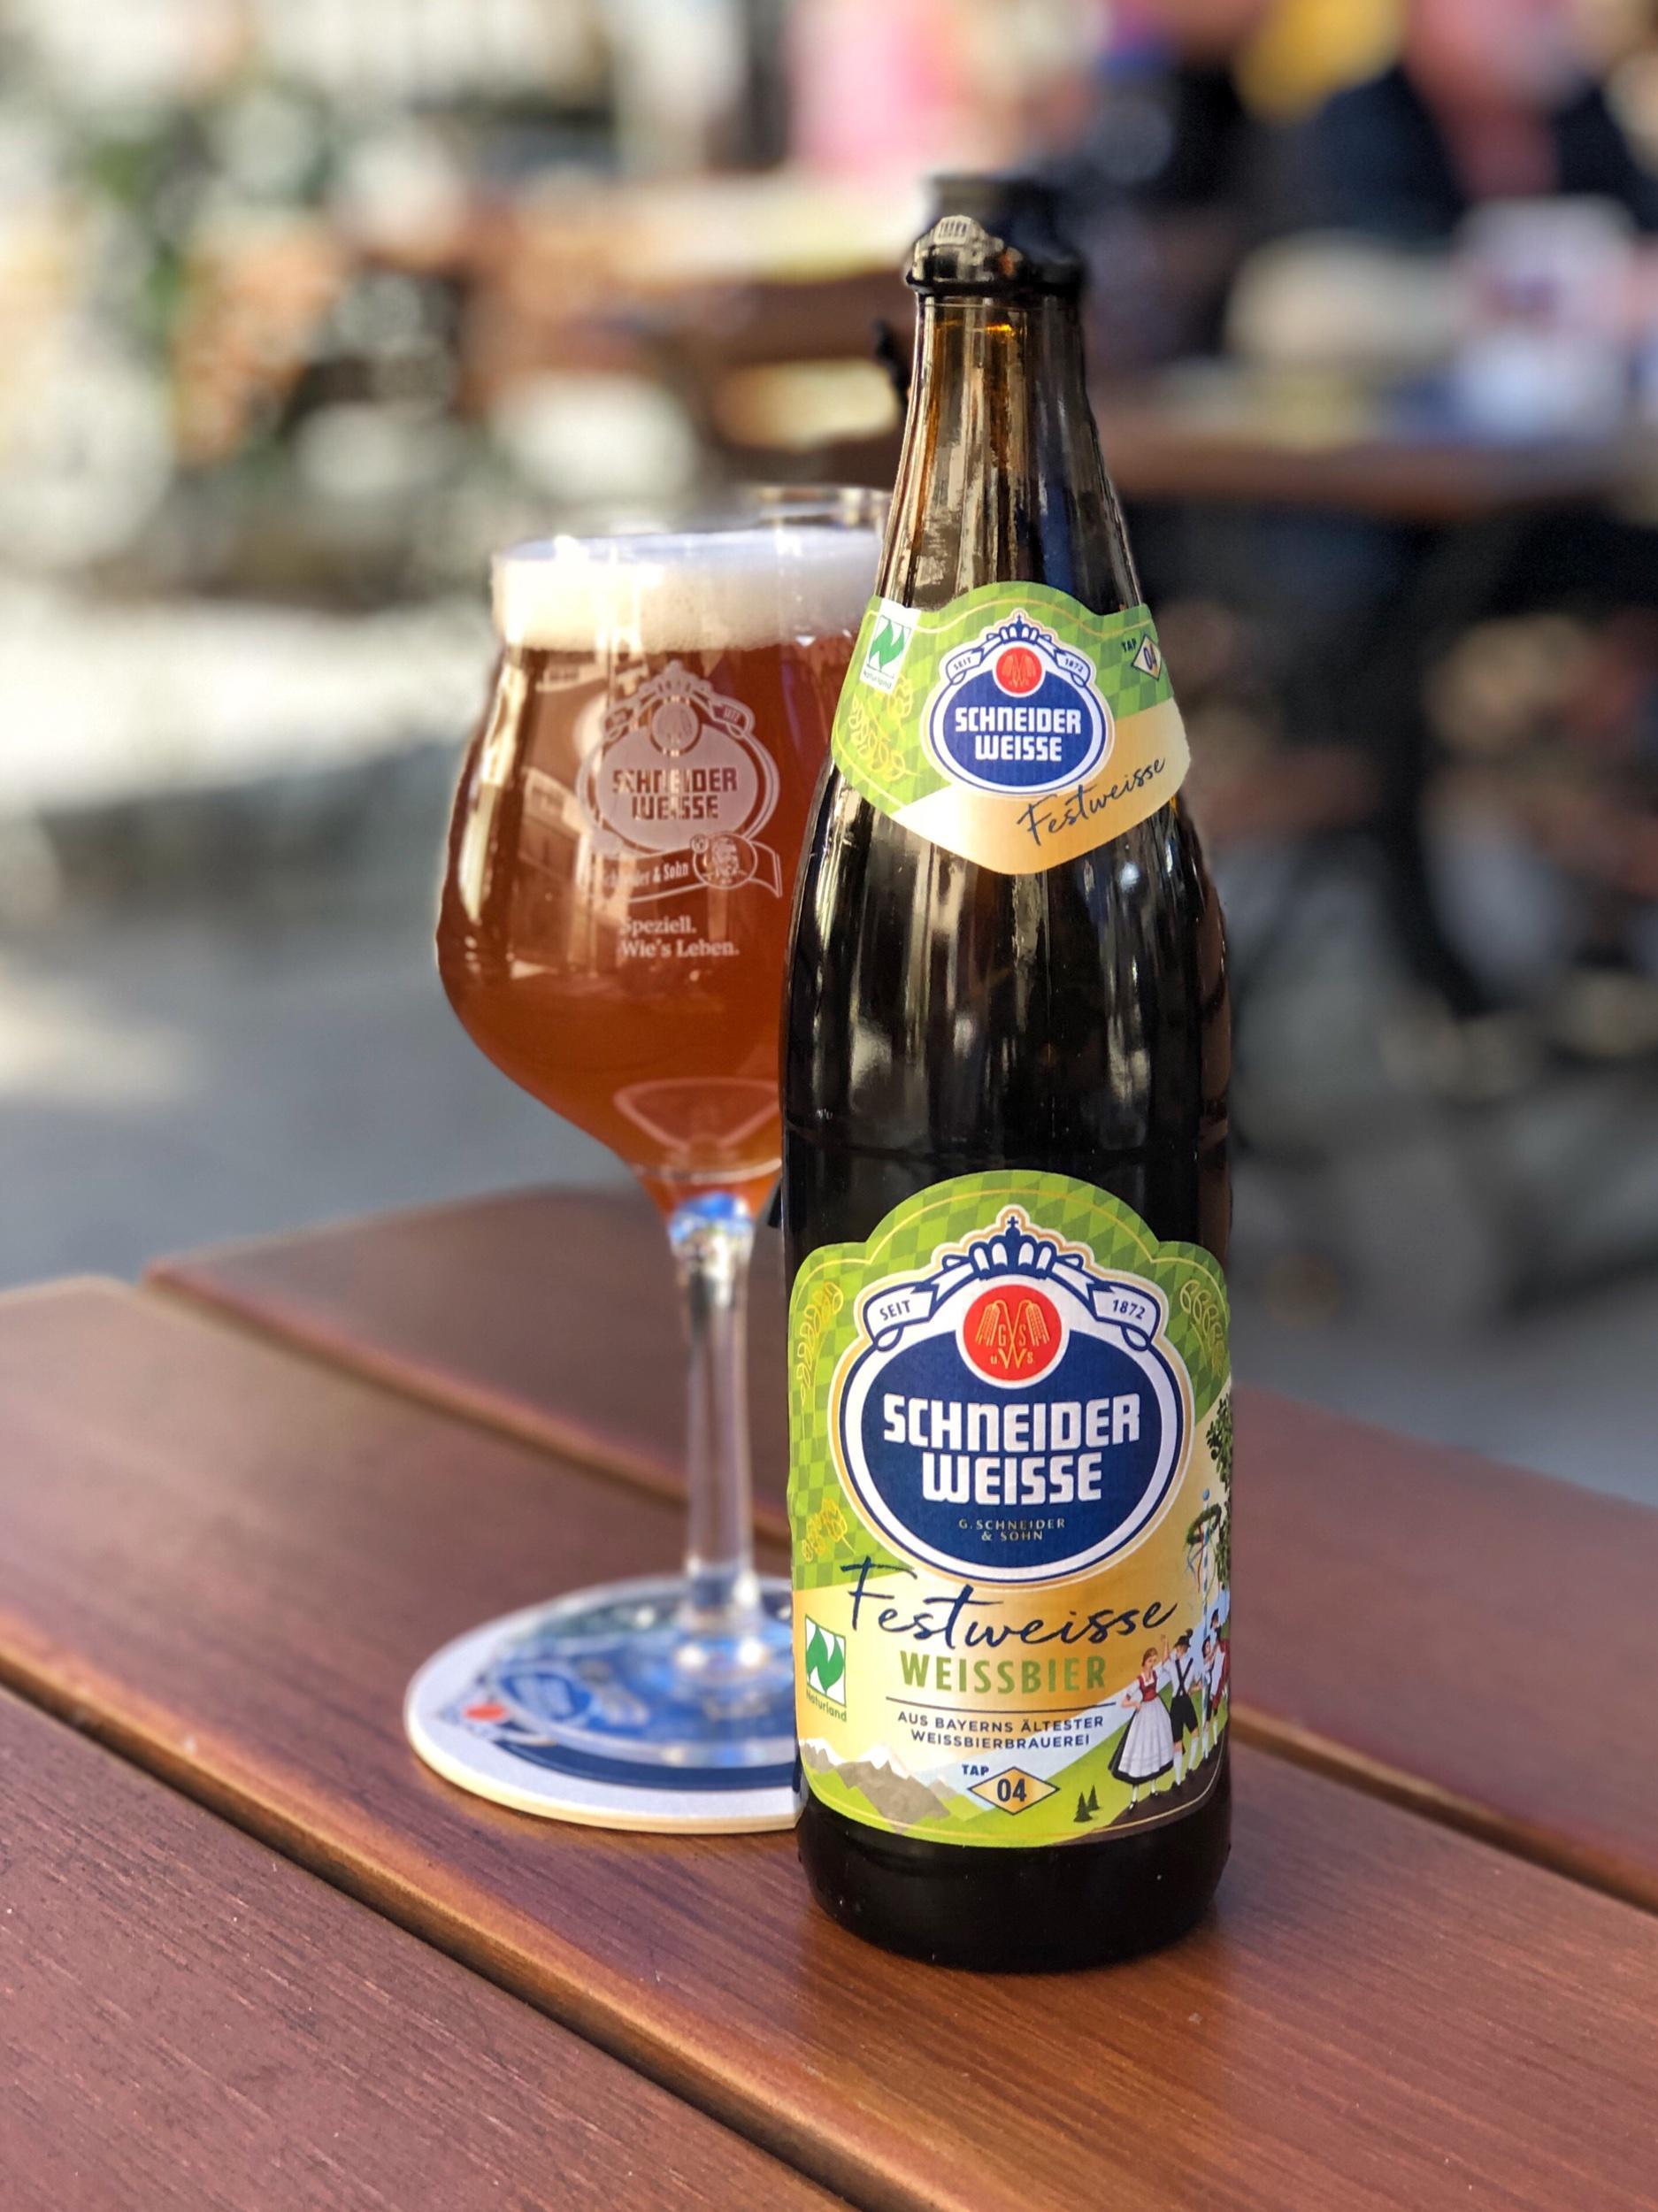 Schneider Festweisse - a beer I haven't seen in the U.S.